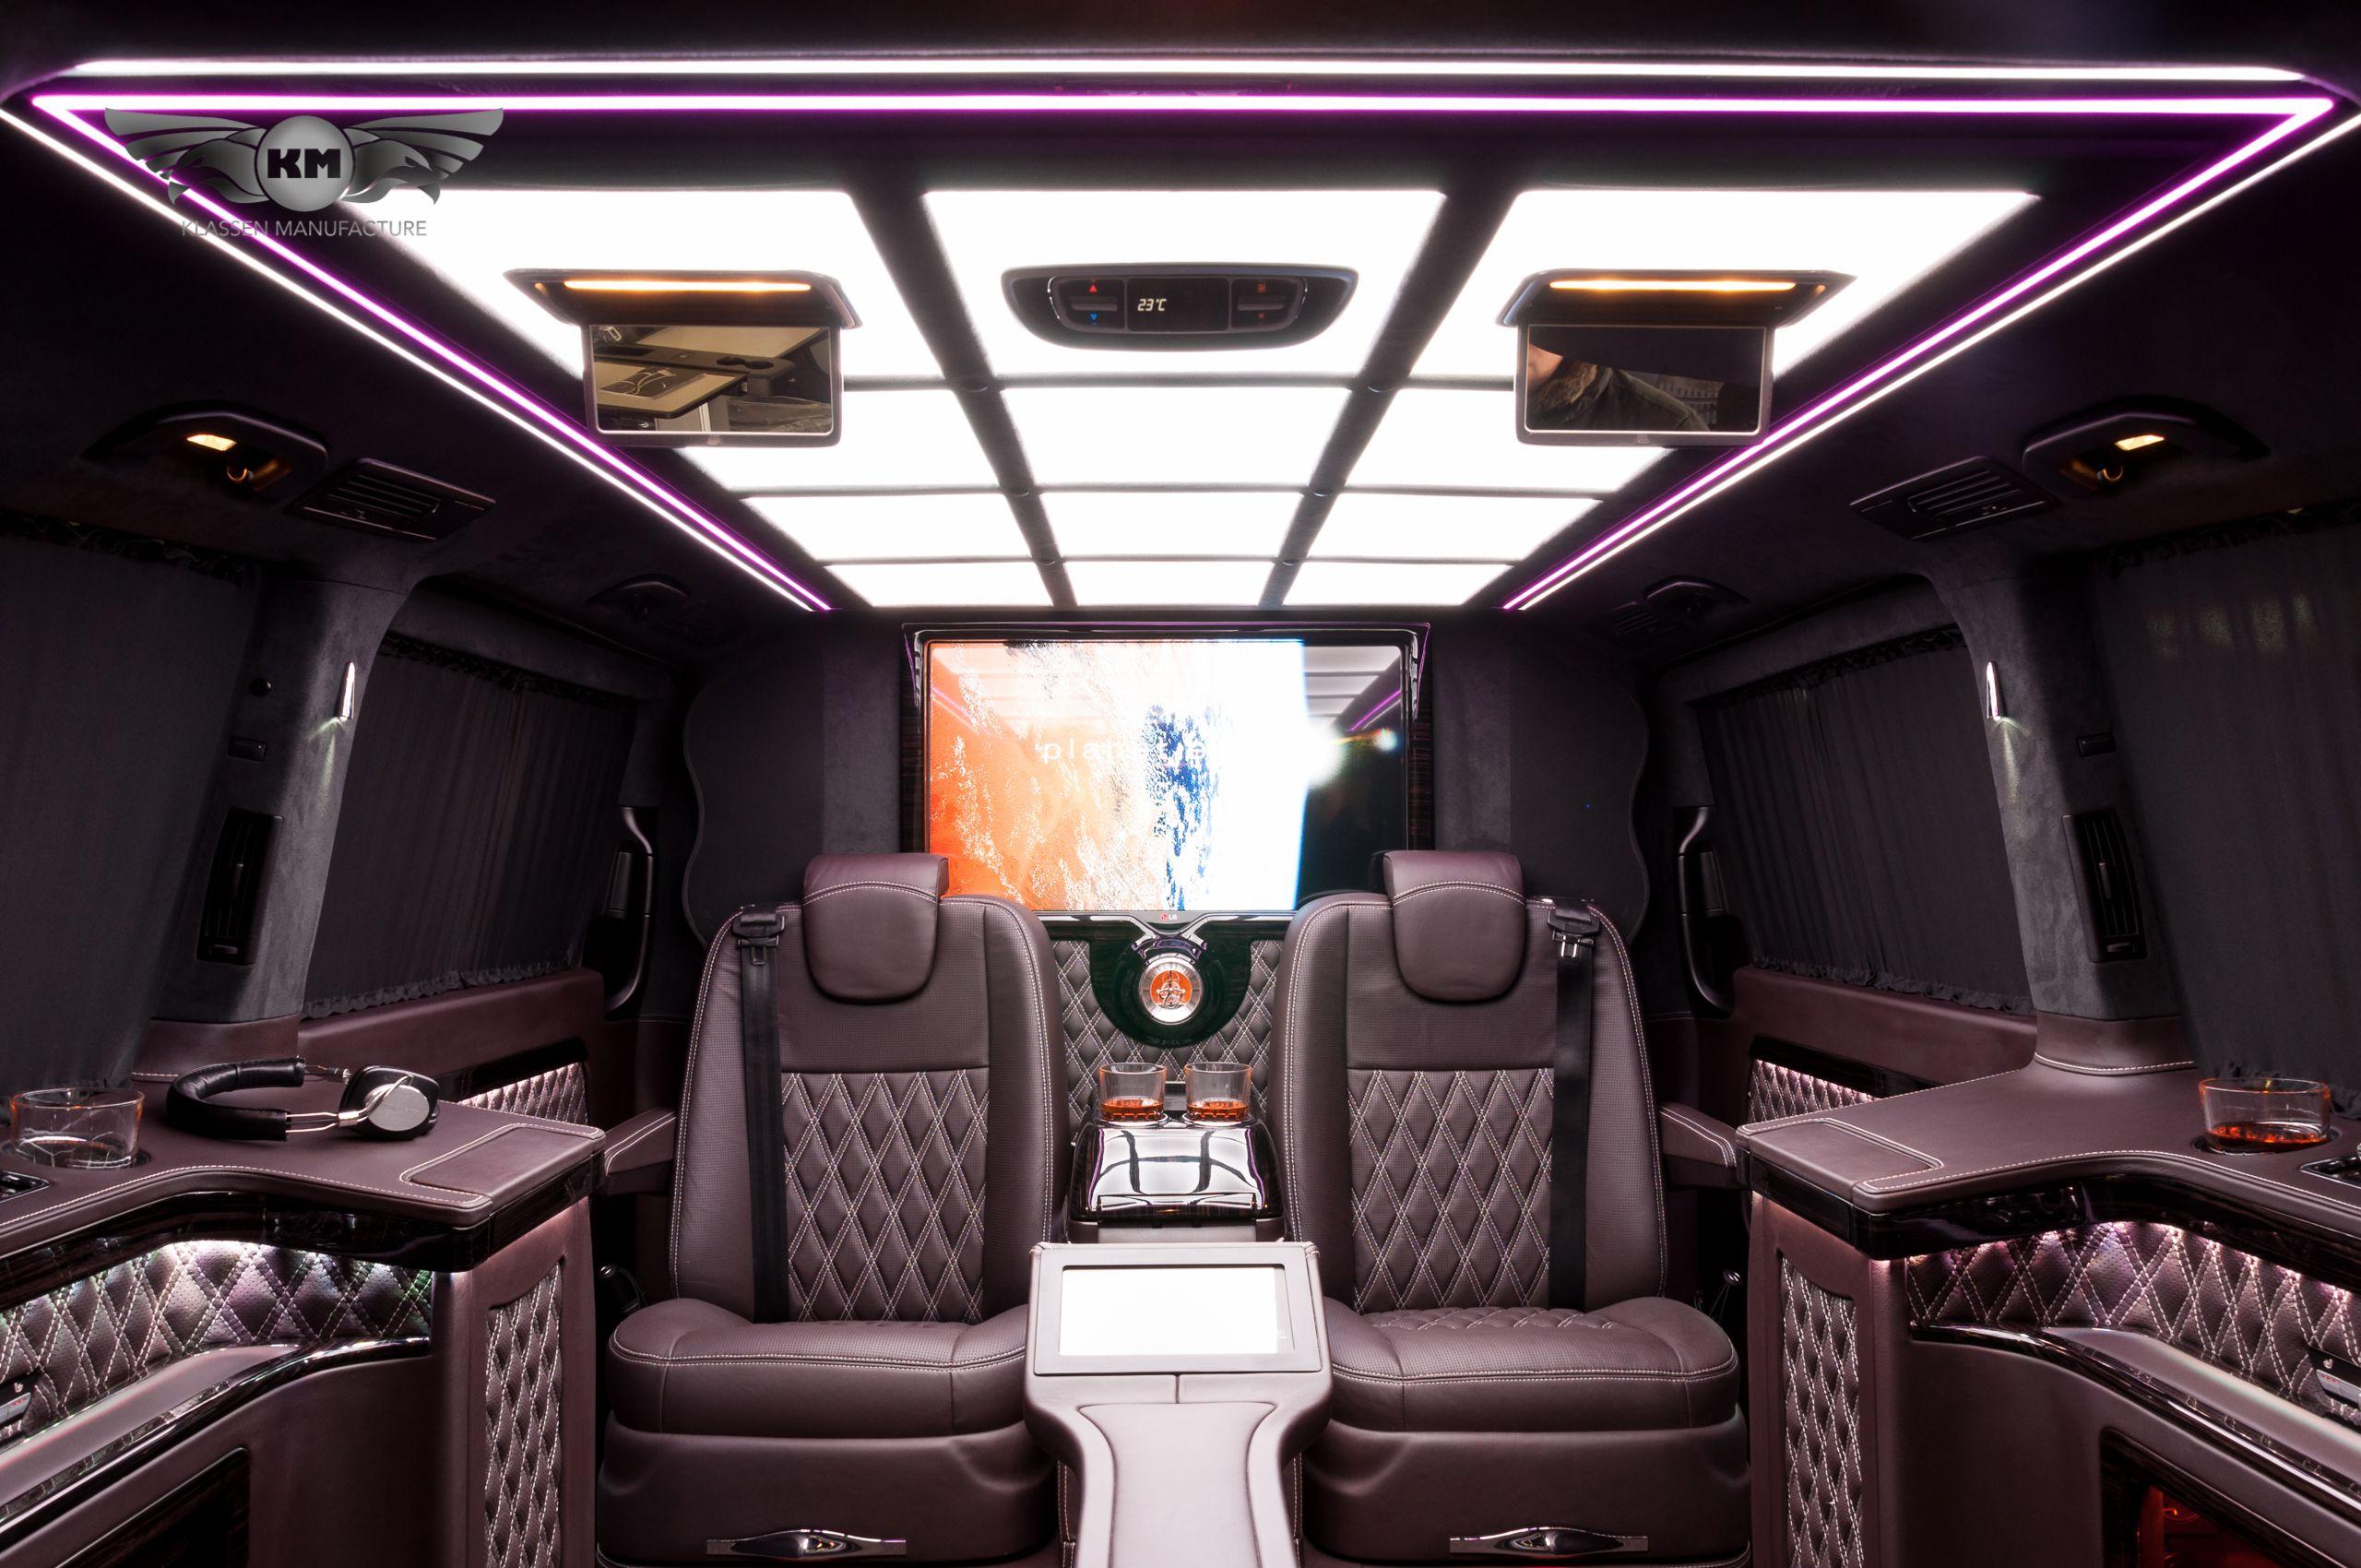 New mercedes benz v class v250 with exclusive business interior vip van